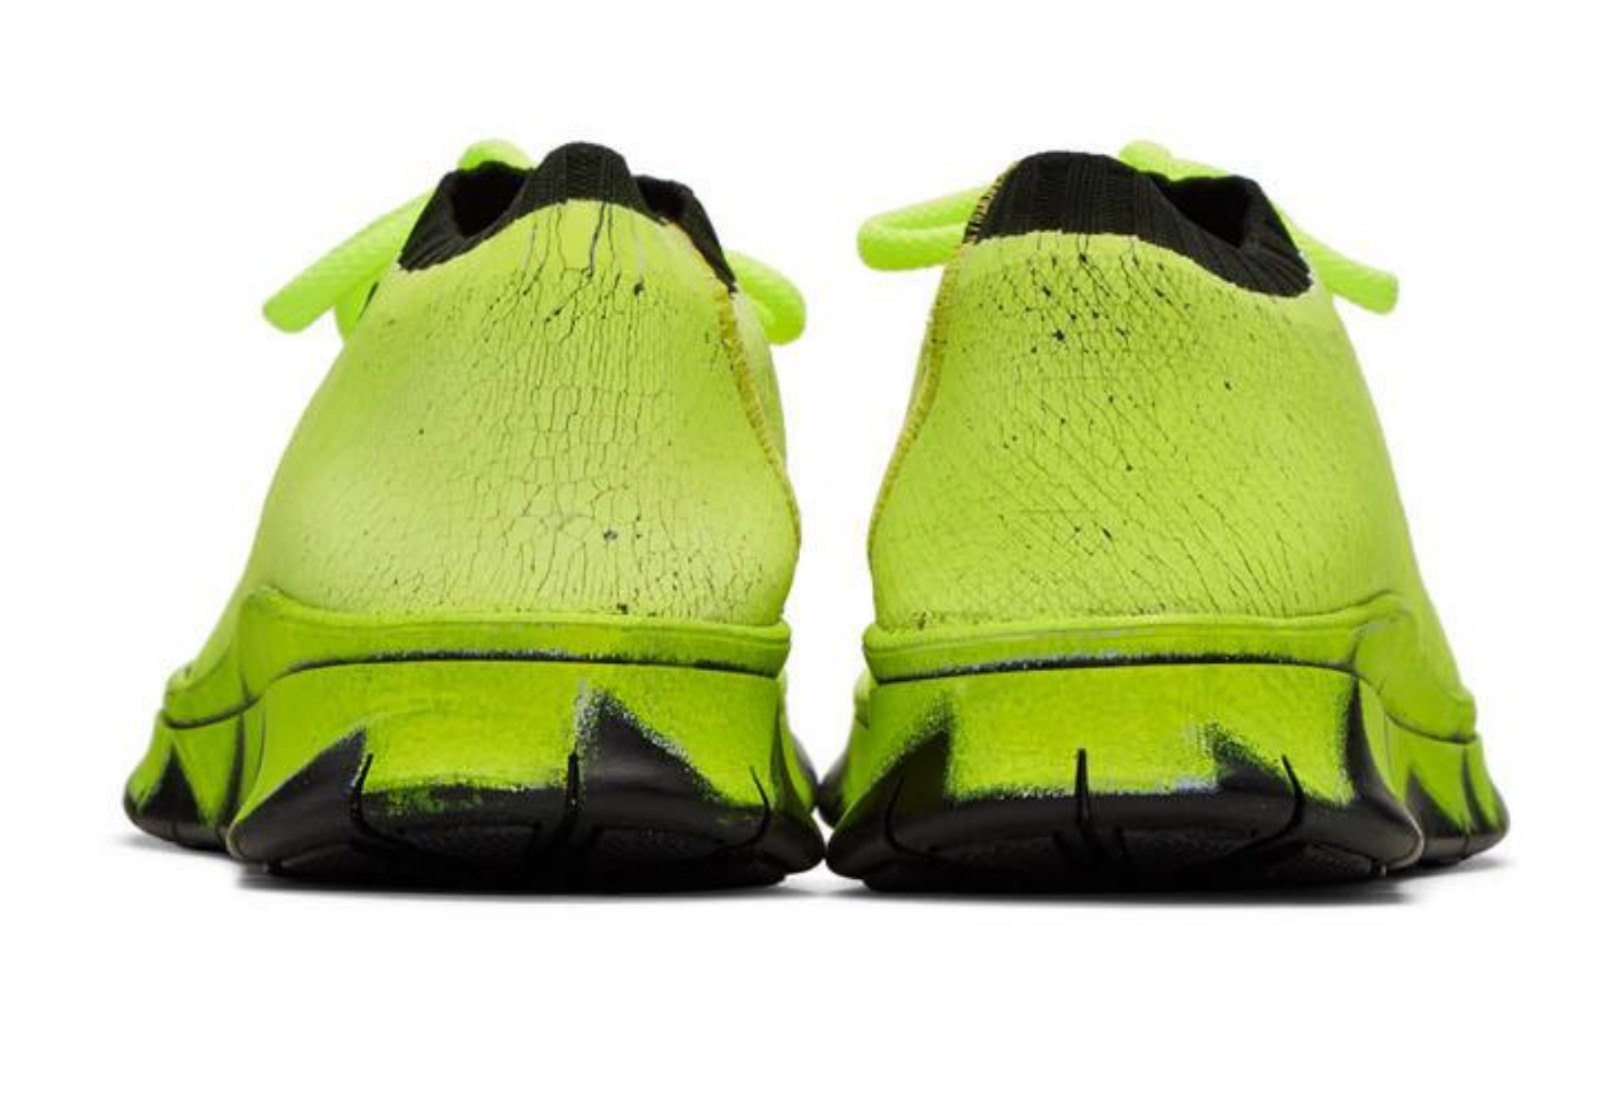 Maison Margiela Deadstock Painted Fluorescent Crackle Knit Shoes Trainers 41